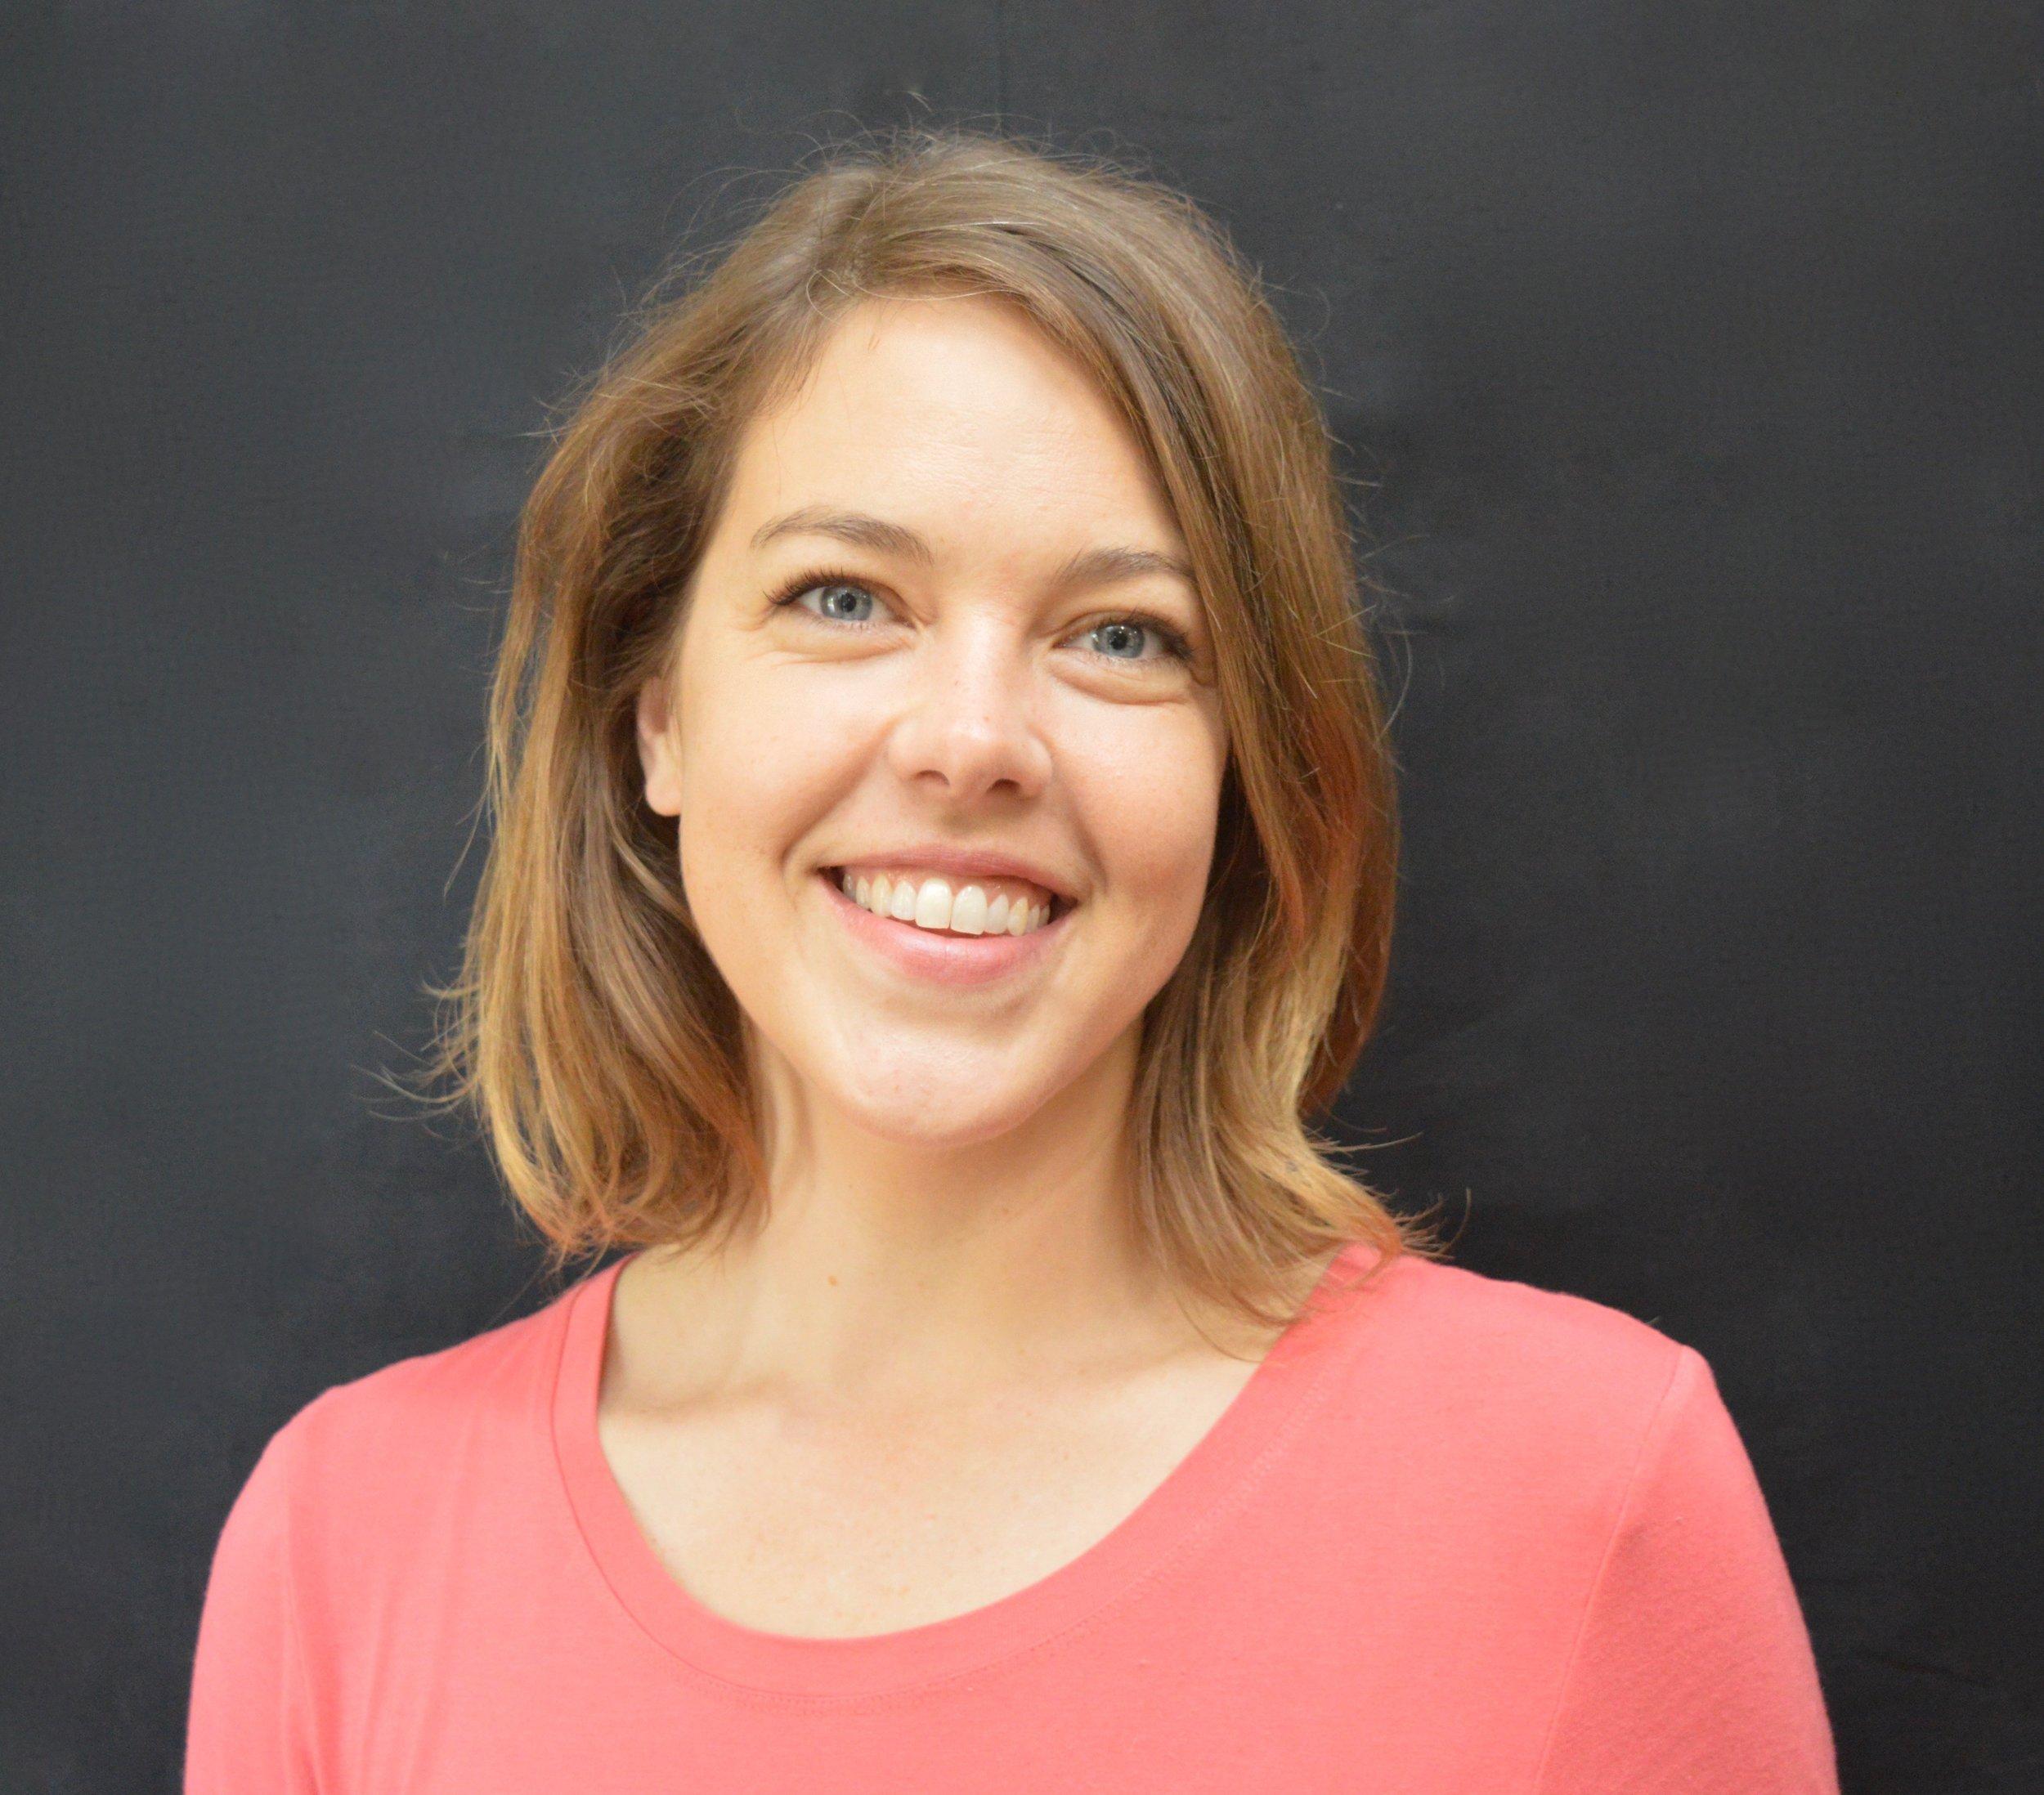 Marin Miller - Christian Education Coordinator